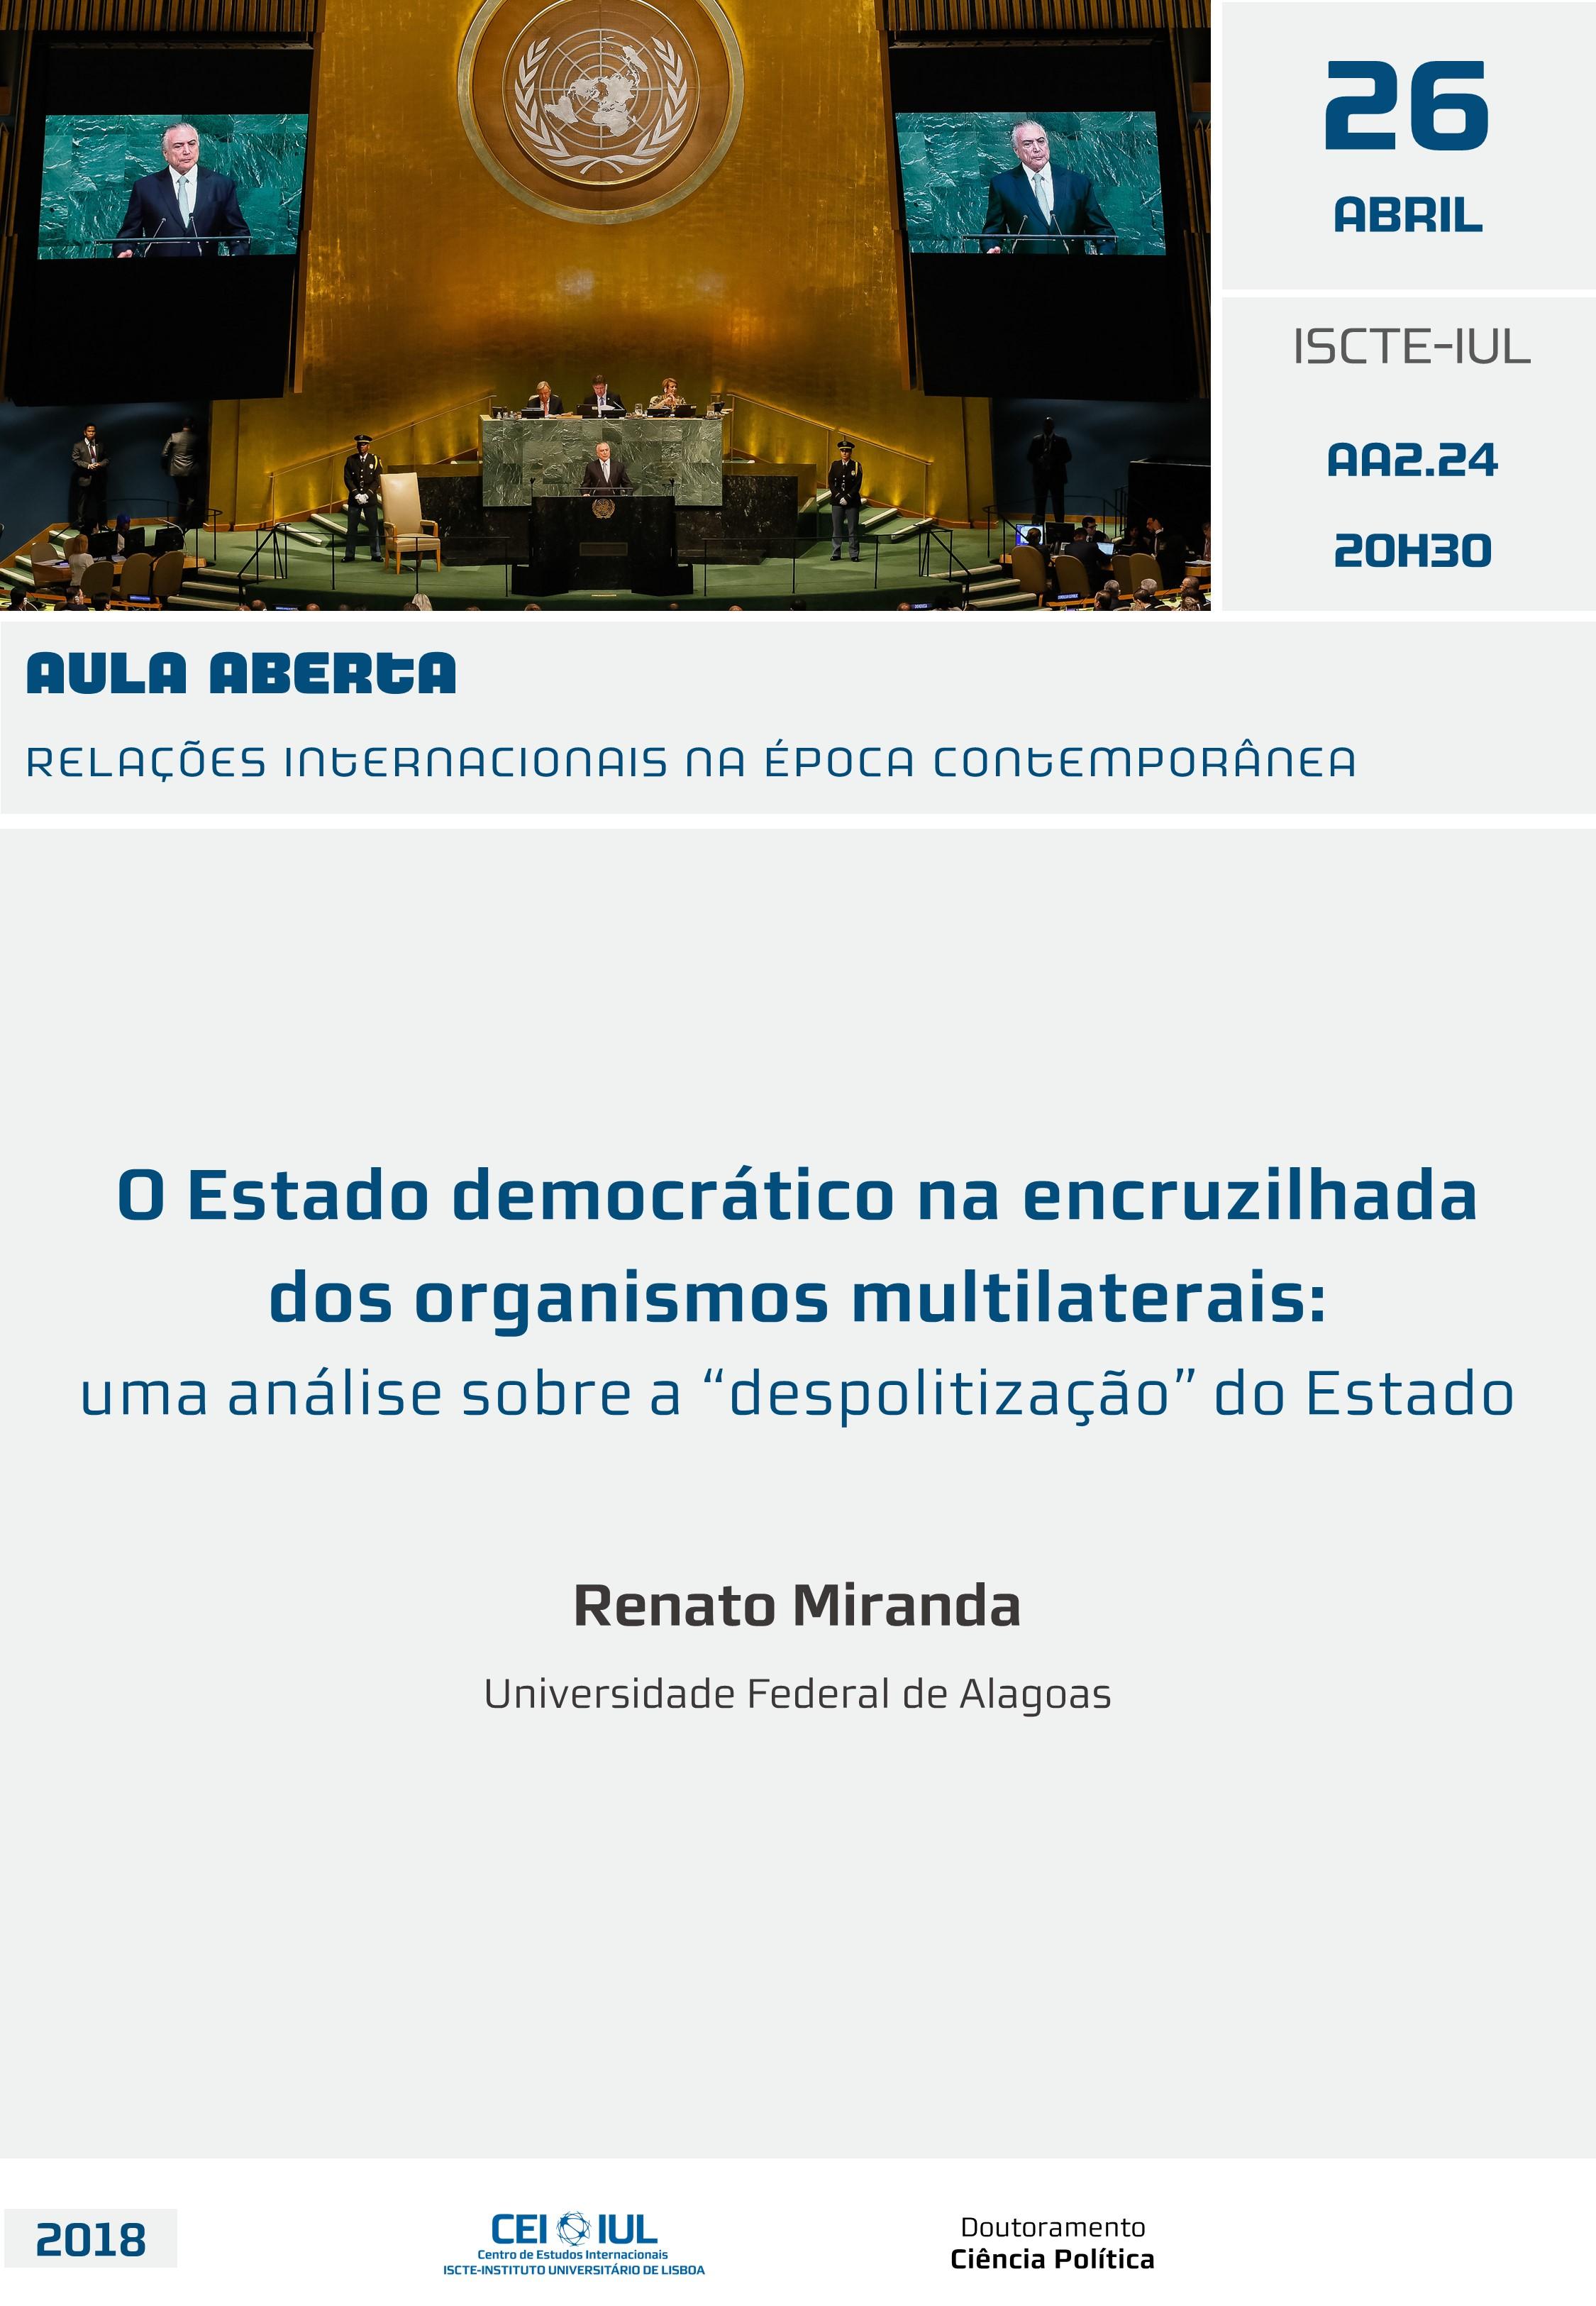 O Estado democrático na encruzilhada dos organismos multilaterais